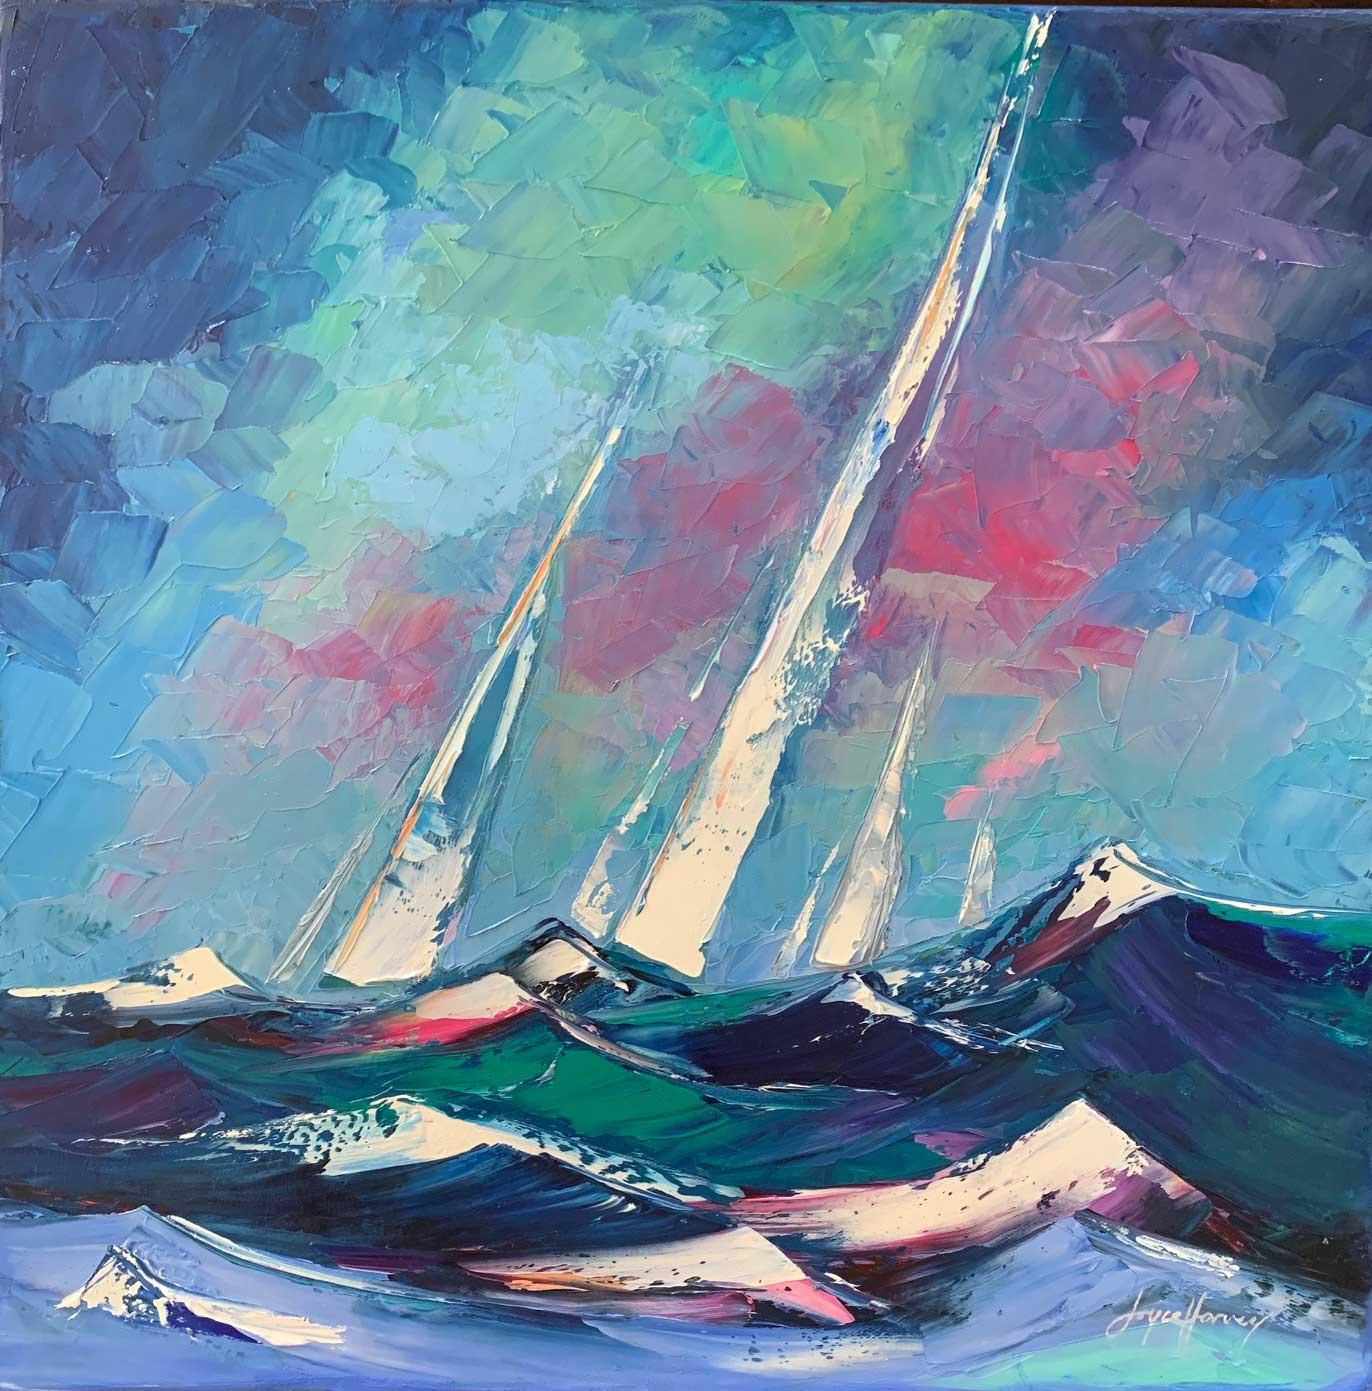 Joyce Harvey, Art Of Sail Oil 20x20 $850